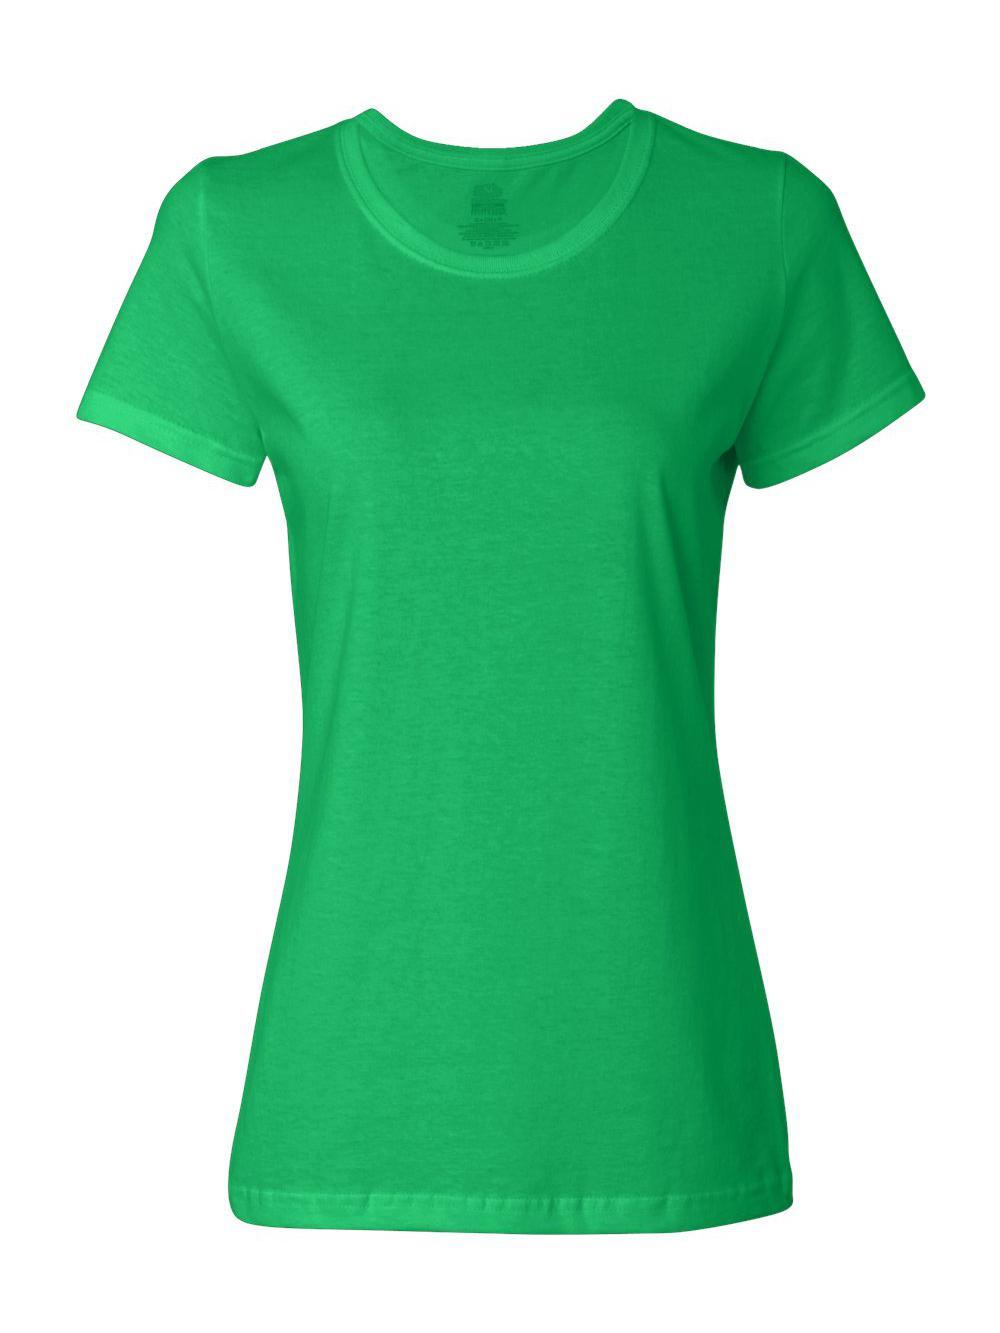 Fruit-of-the-Loom-HD-Cotton-Women-039-s-Short-Sleeve-T-Shirt-L3930R thumbnail 18